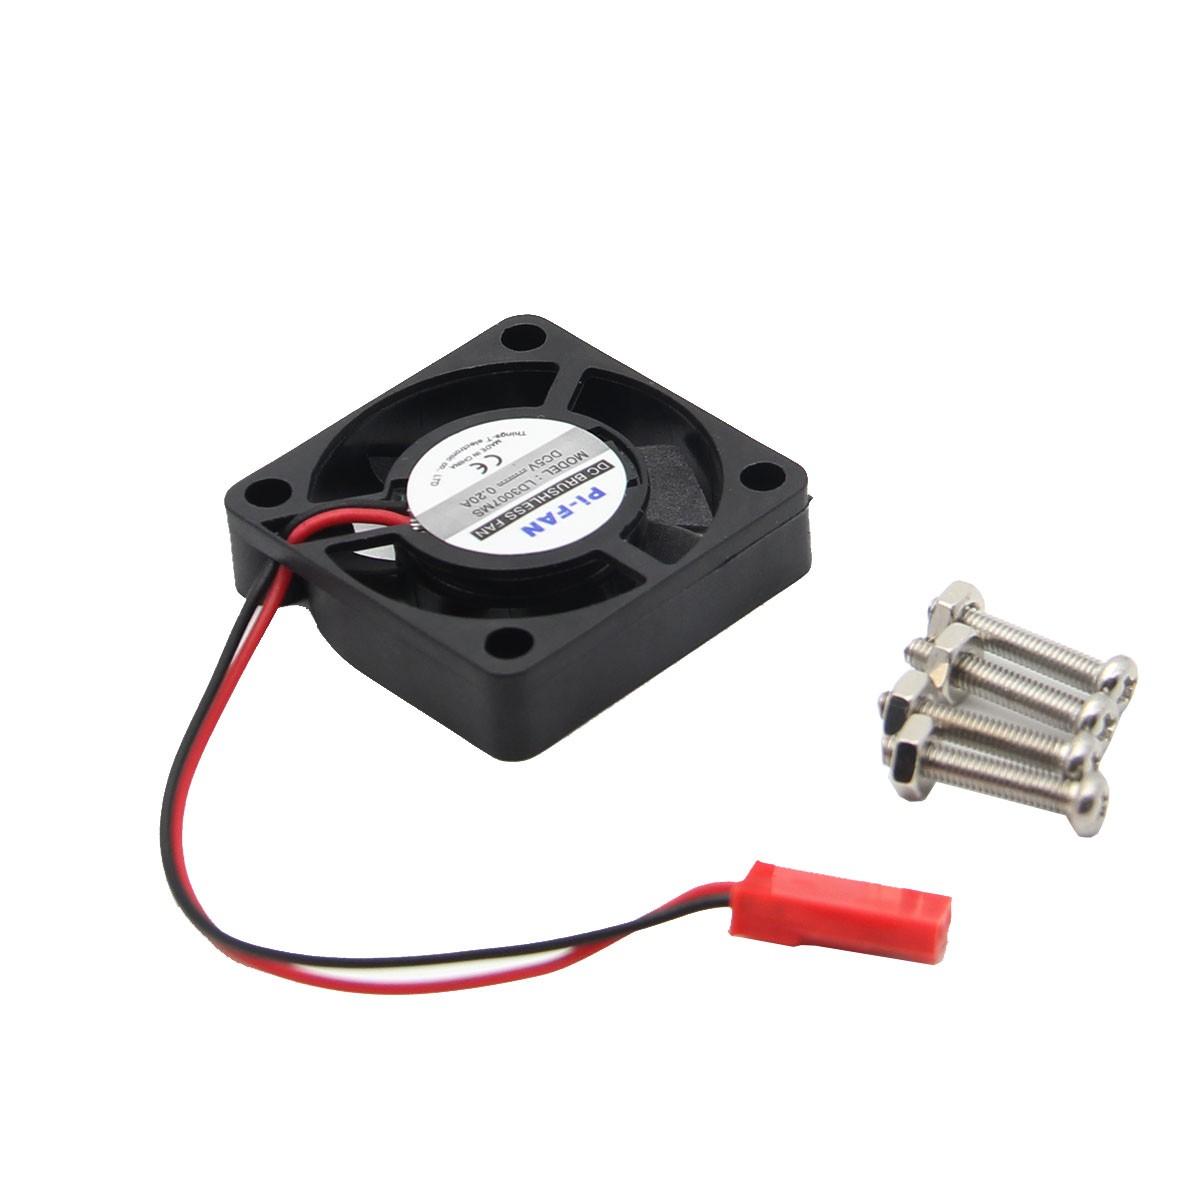 Catda 2GB RAM Raspberry Pi 4B + Cover Box + Power Supply + 32/64GB Memory Card +Micro HDMI DIY Kit